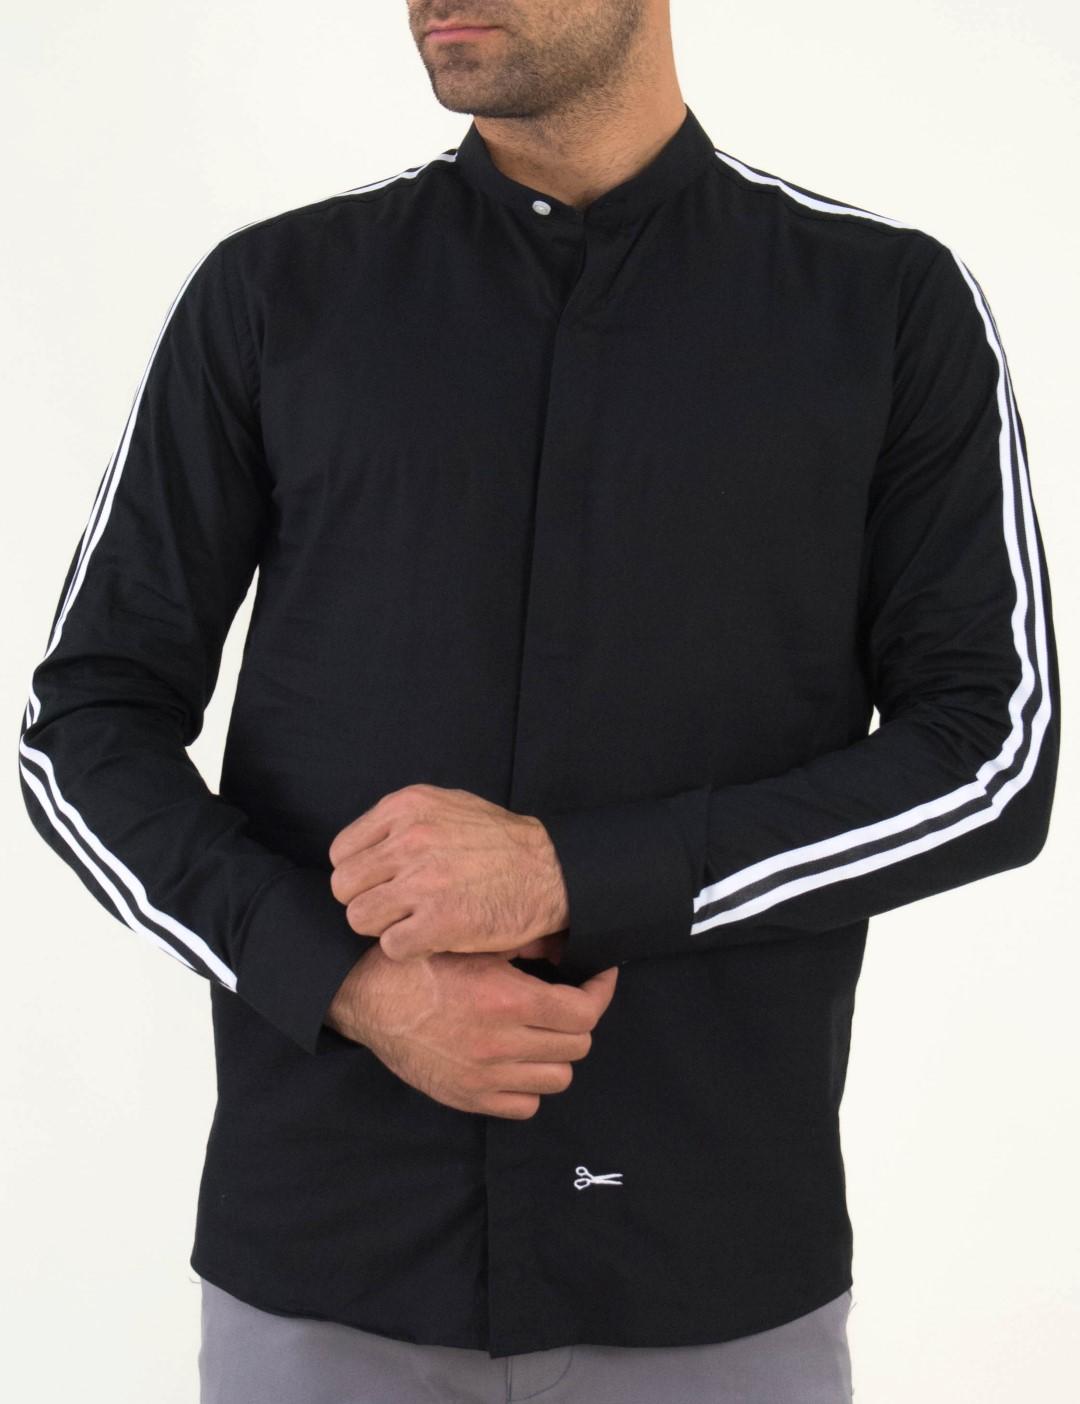 8f3c78f3c0cd Ανδρικό μαύρο πουκάμισο λευκή ρίγα μάο γιακάς Ben Tailor 1099